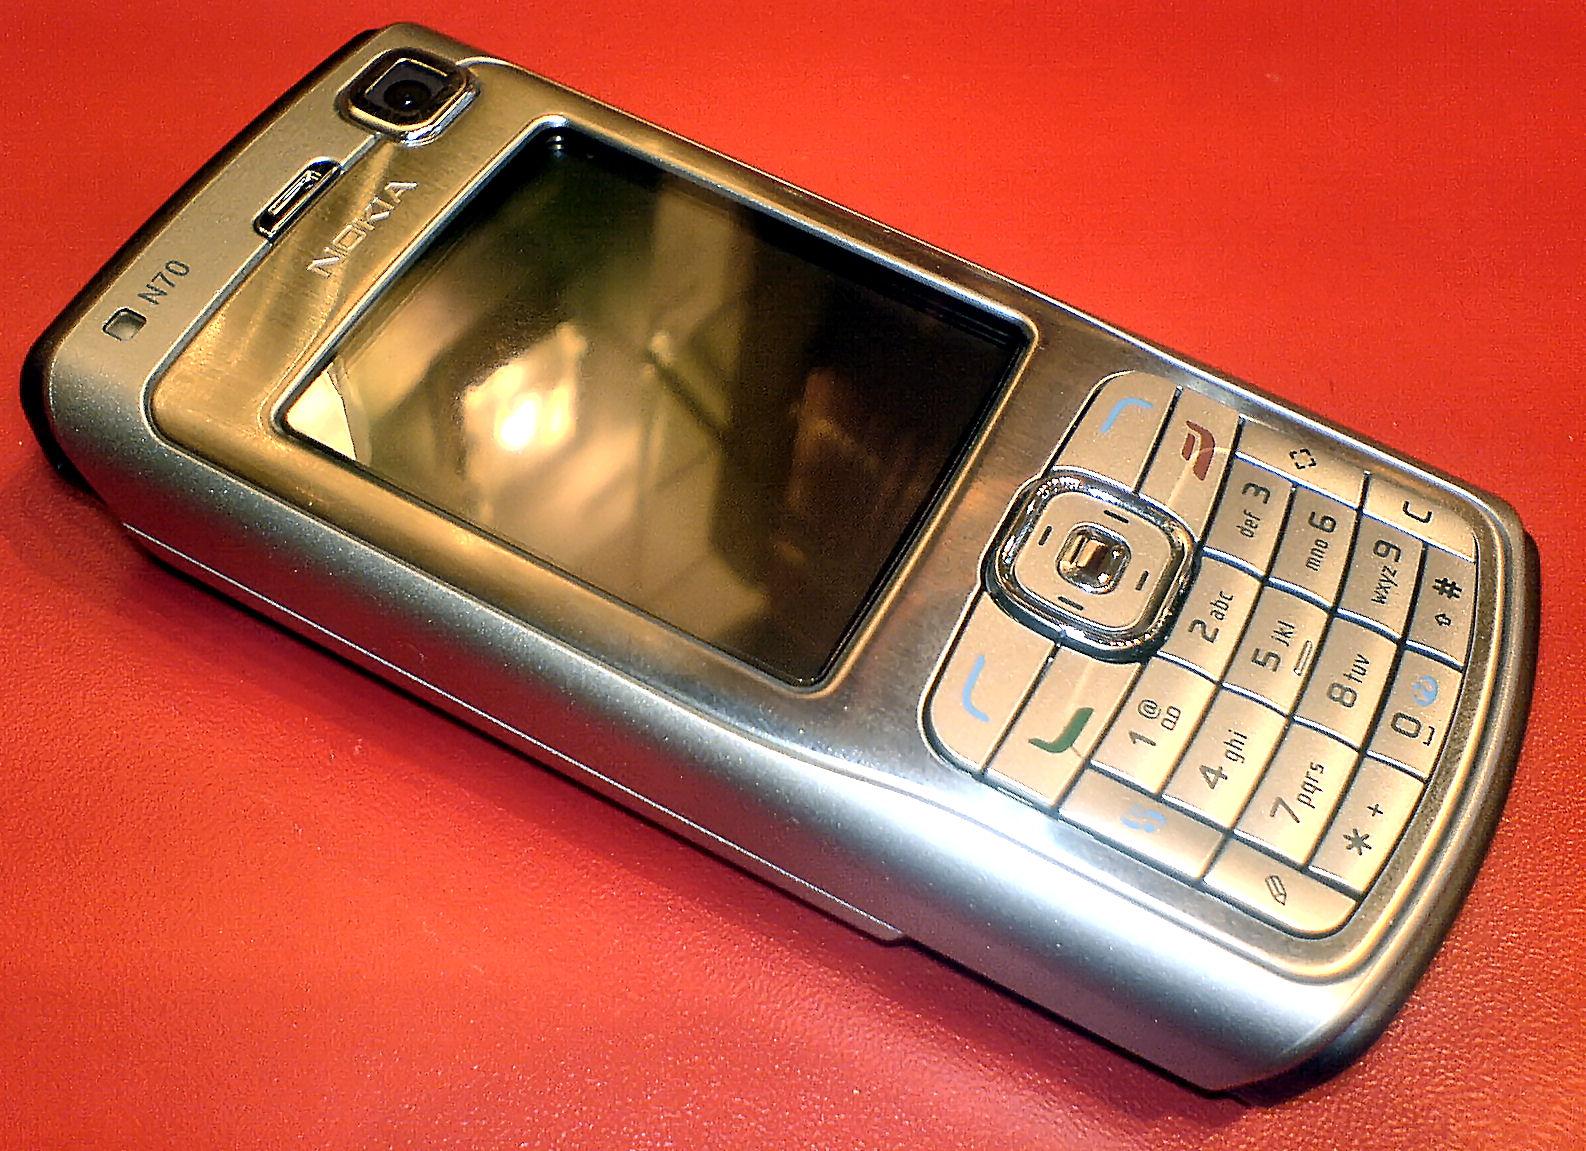 Nokia N70 - Wikipedia